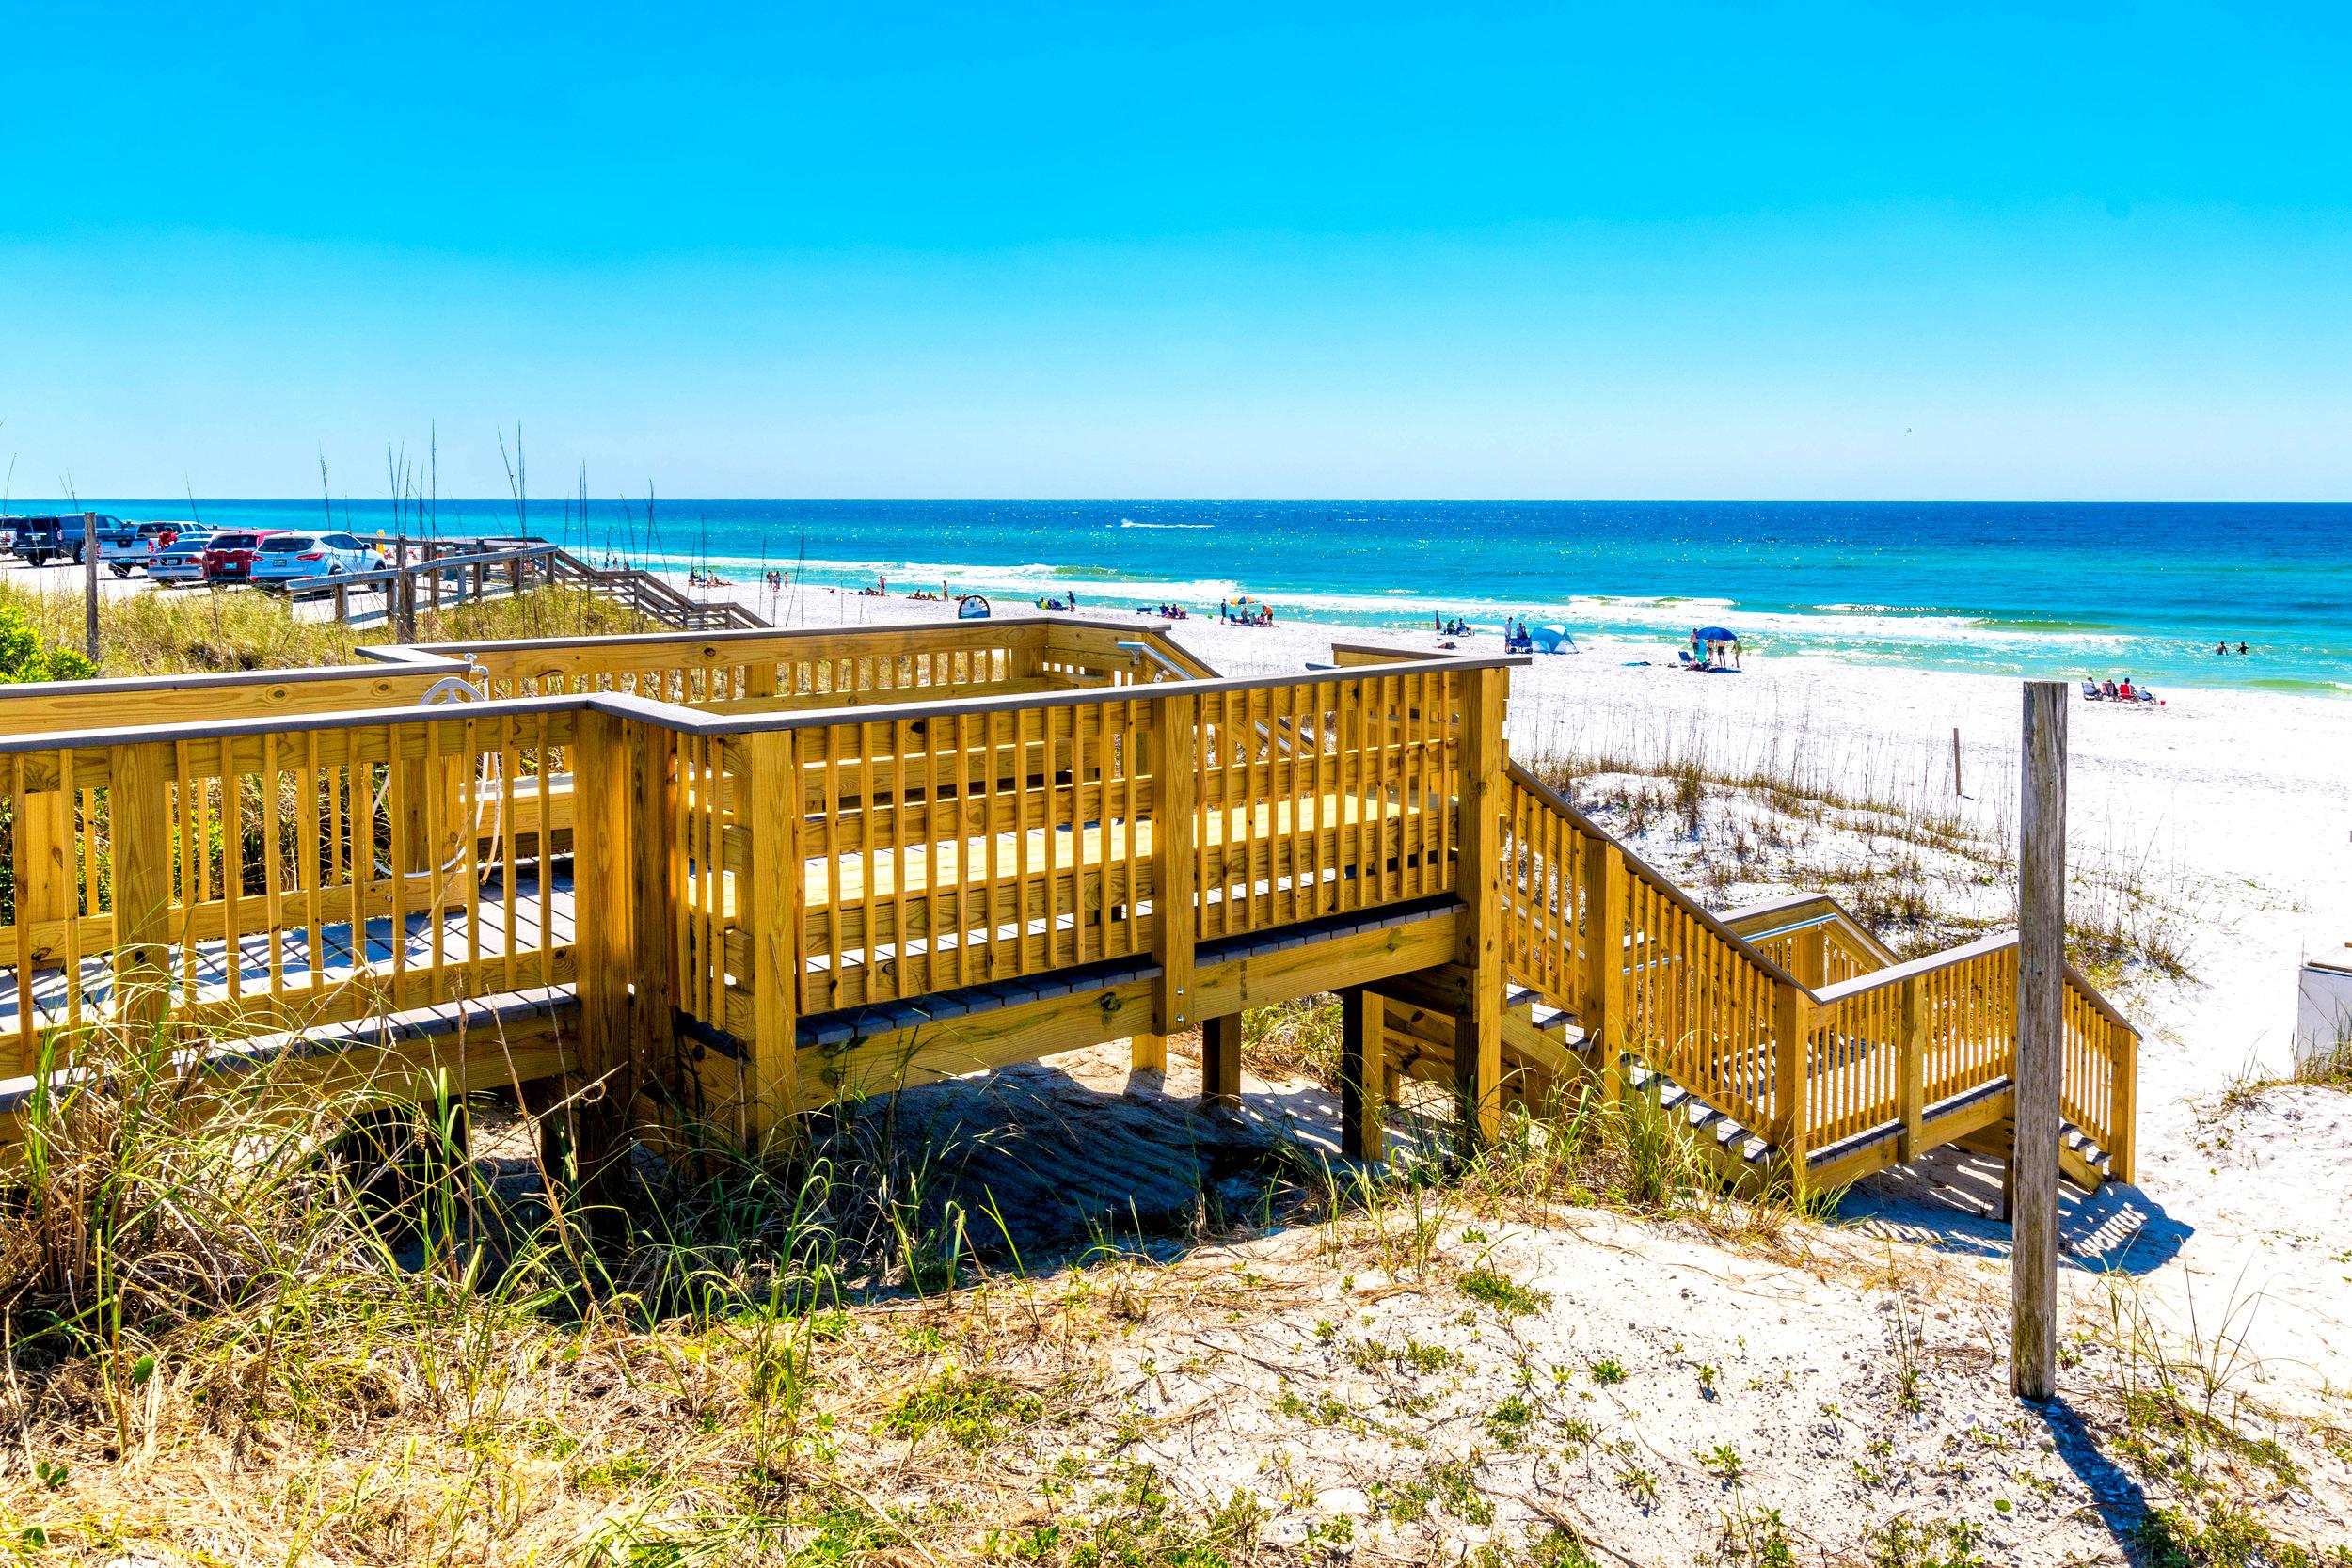 Boardwalk Construction